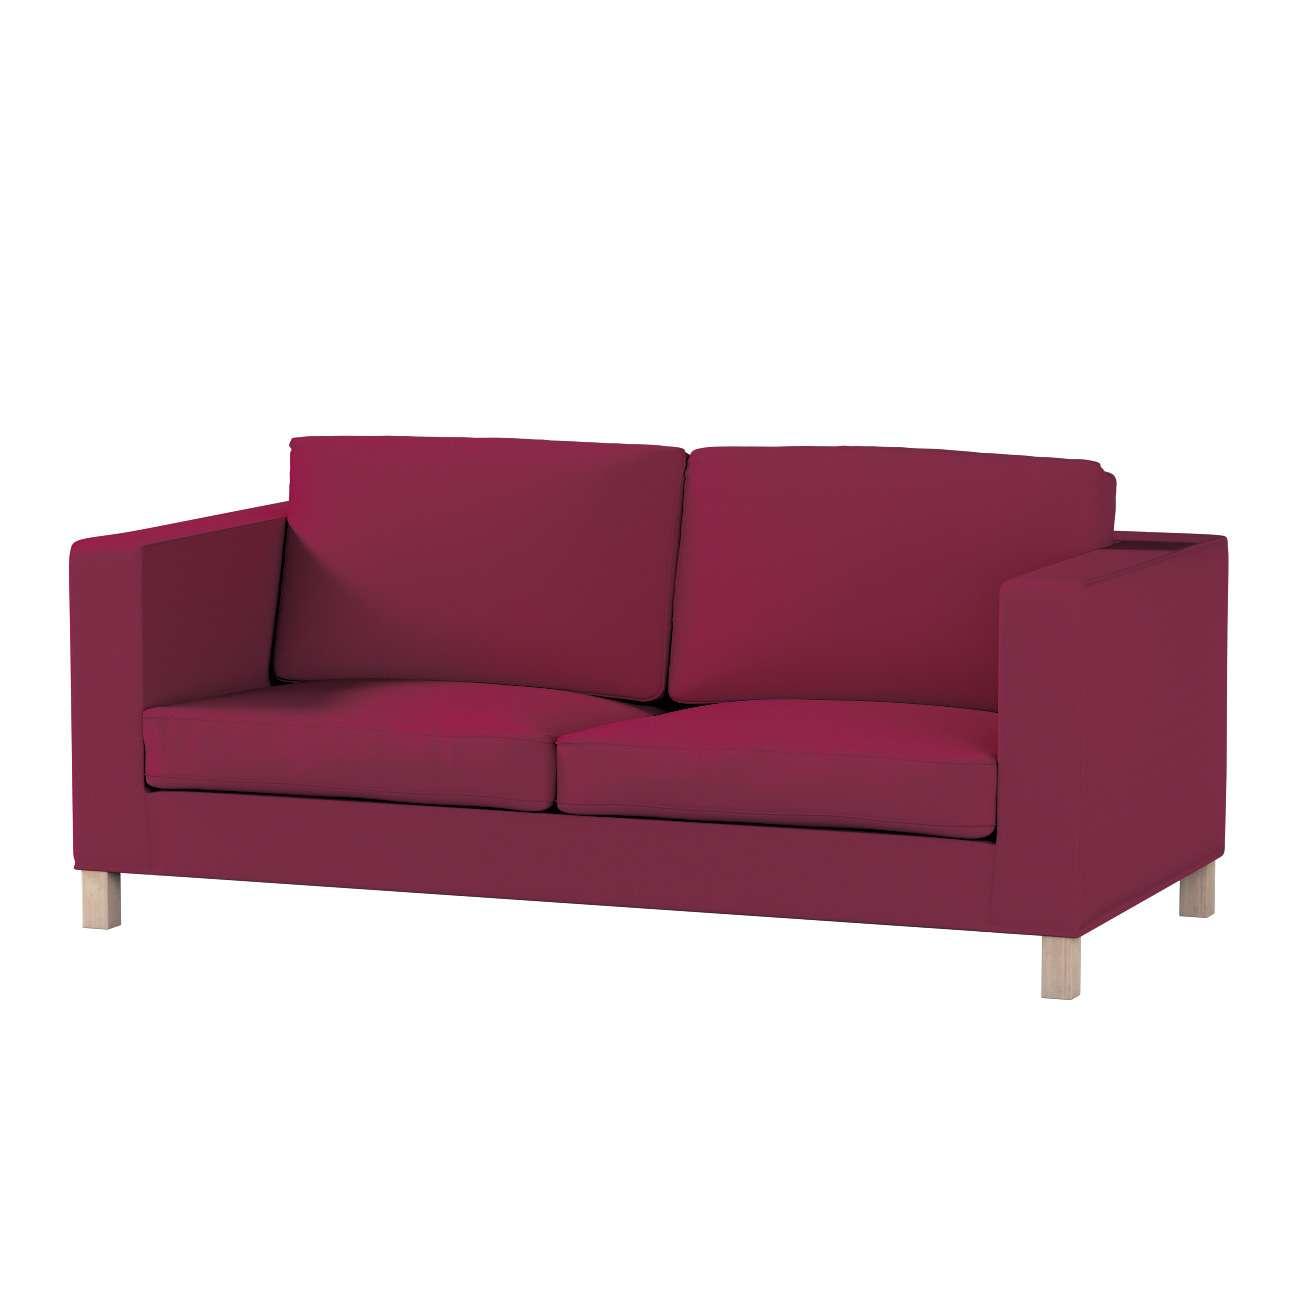 Potah na pohovku IKEA  Karlanda rozkládací, krátký pohovka Karlanda rozkládací v kolekci Cotton Panama, látka: 702-32